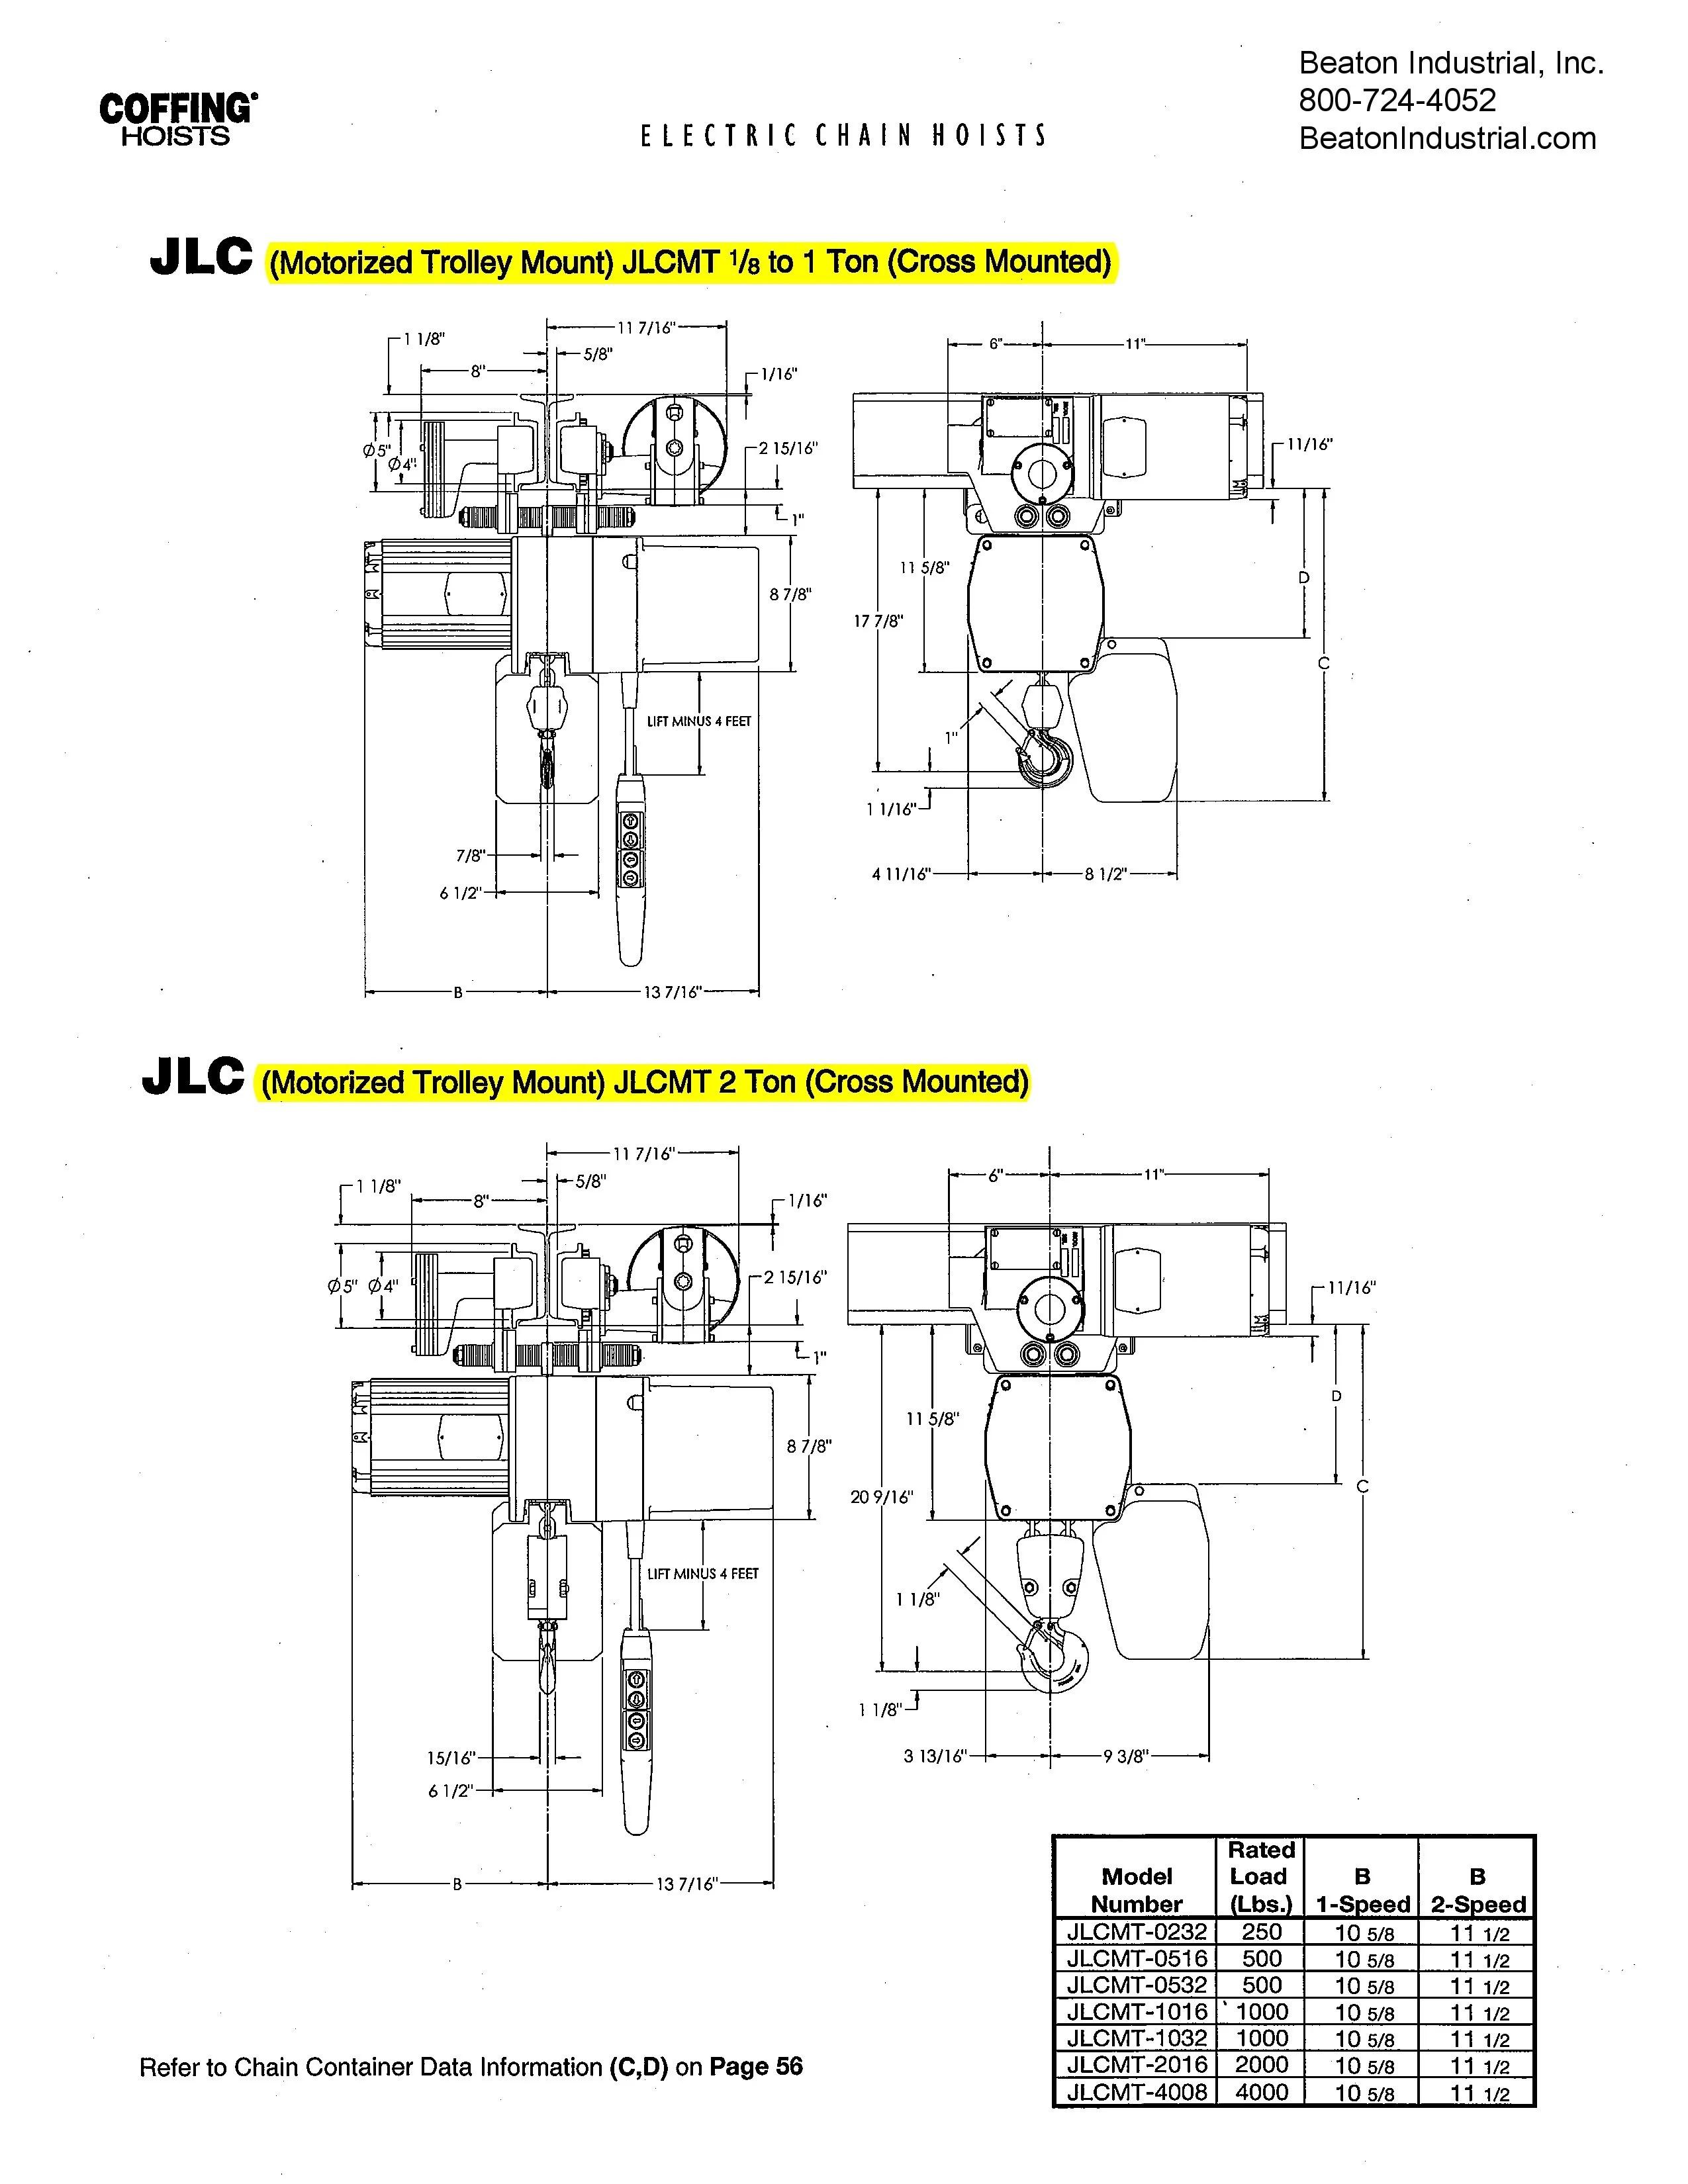 wiring coffing diagram hoist ec2004 4 wiring diagram used coffing chain hoist wiring diagram coffing chain [ 2550 x 3300 Pixel ]